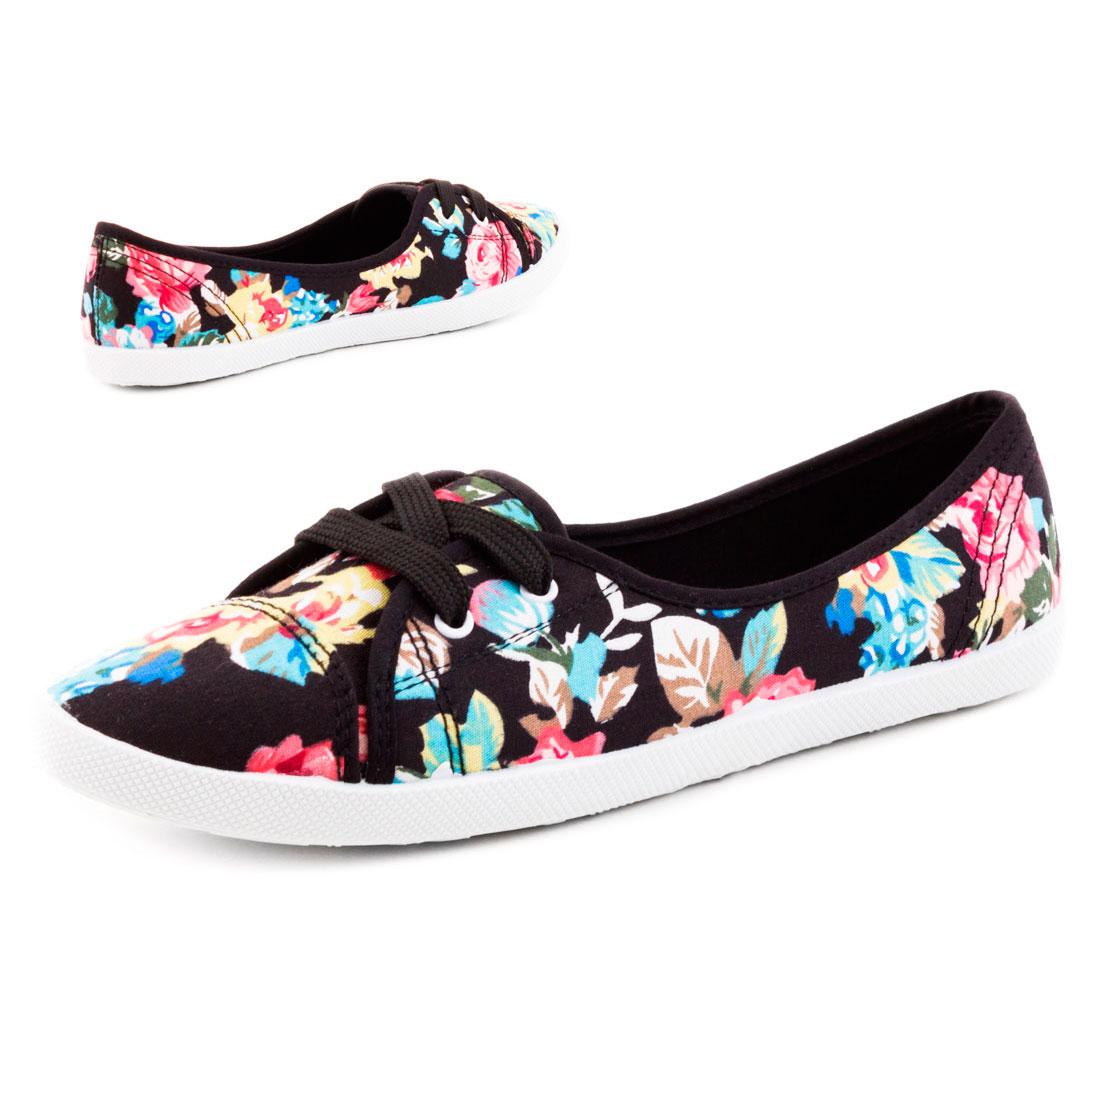 neu damen slipper sommer sneaker ballerinas canvas schuhe. Black Bedroom Furniture Sets. Home Design Ideas